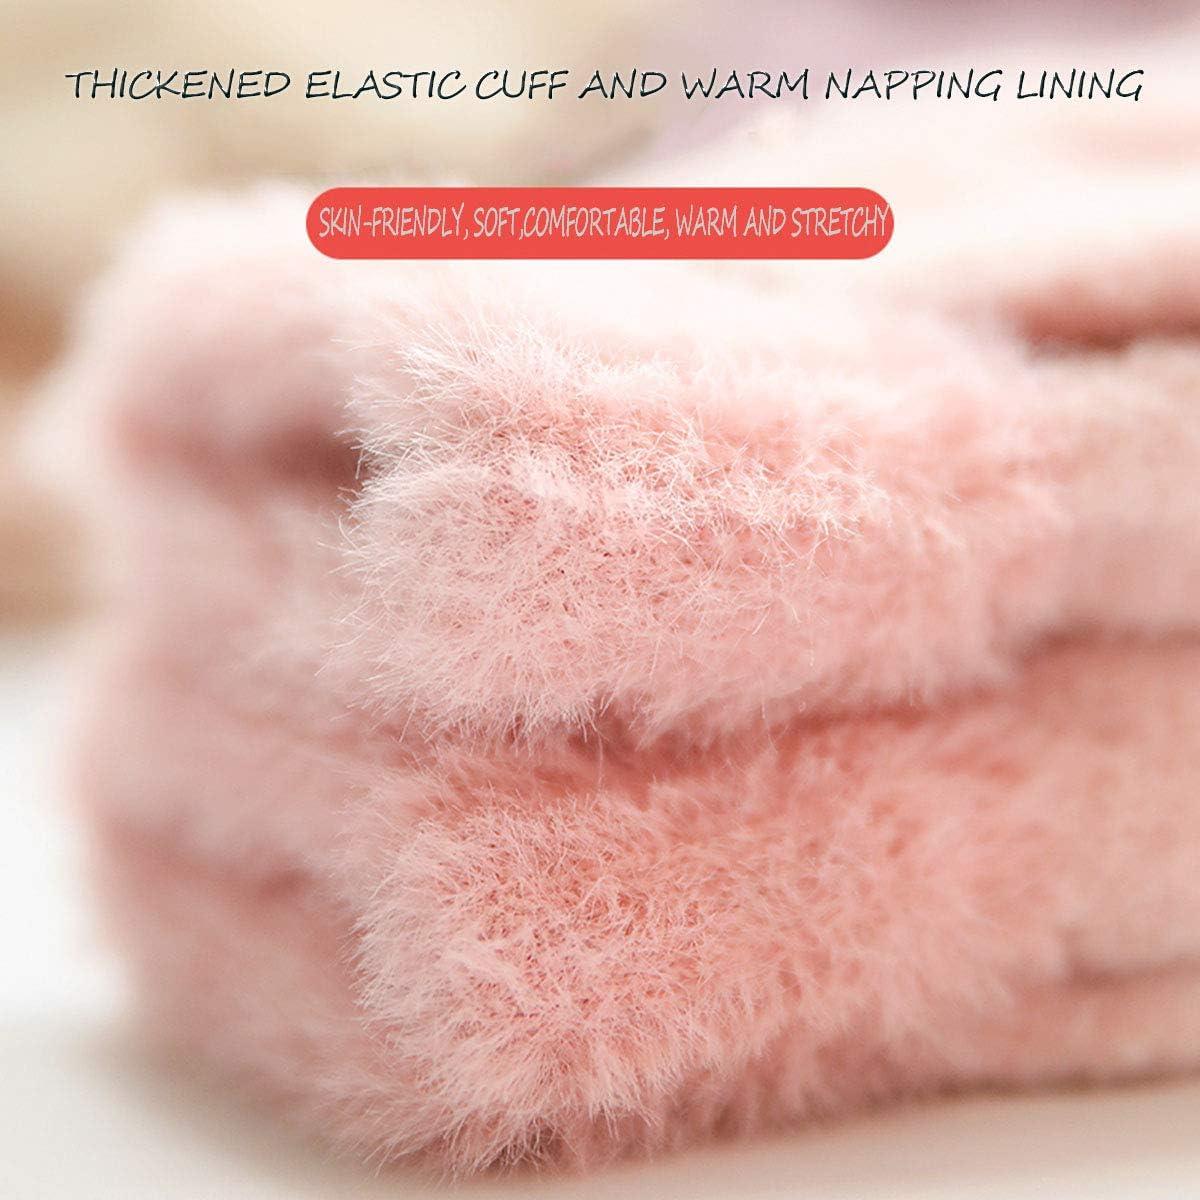 Convertible Fingerless Gloves Texting Gloves Stretch Knit Gloves Winter Warm Gloves Mittens Gift for Girlfriend